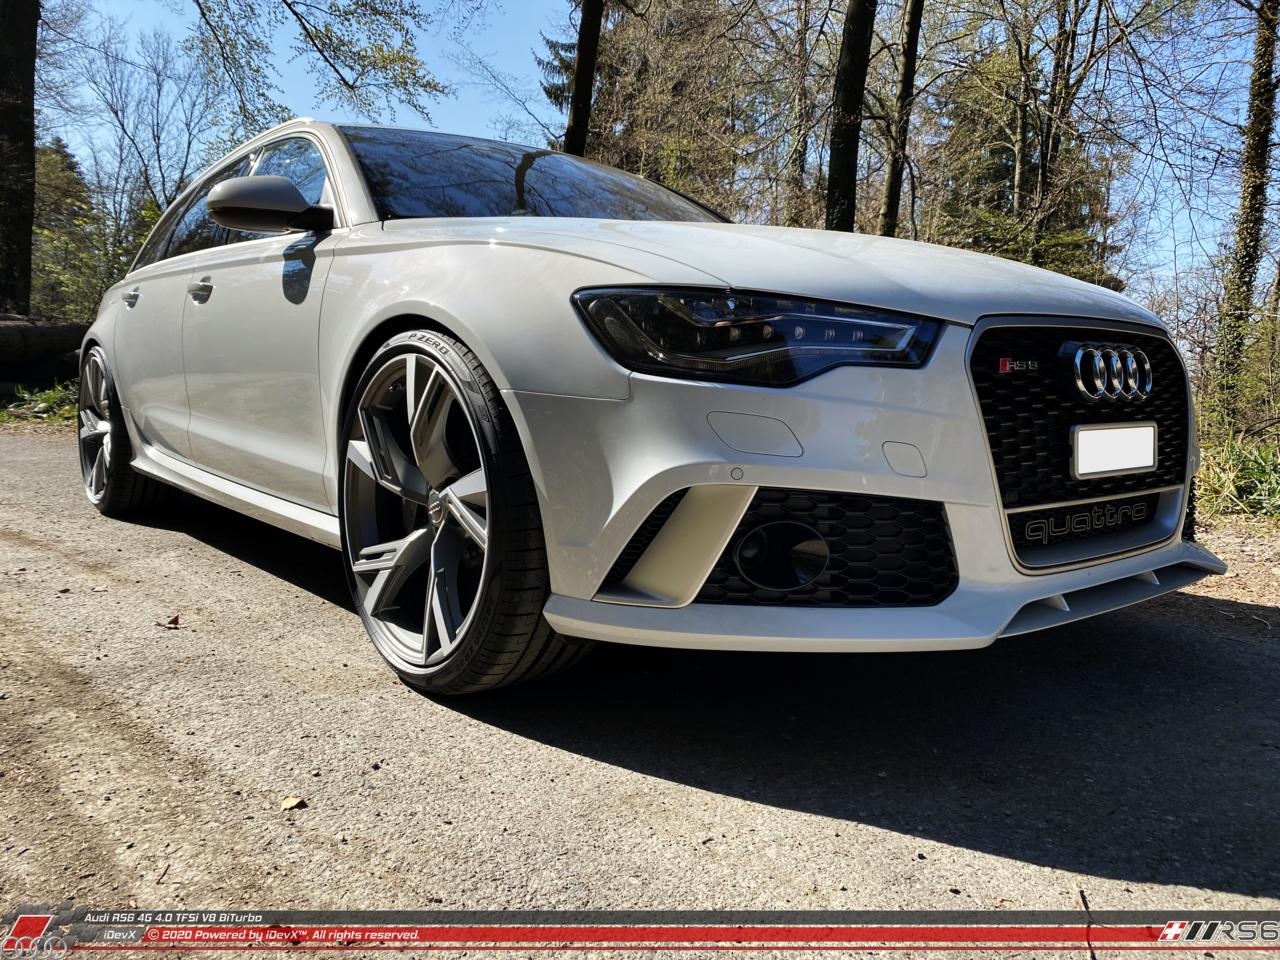 11.04.2020_Audi-RS6_iDevX_001.png